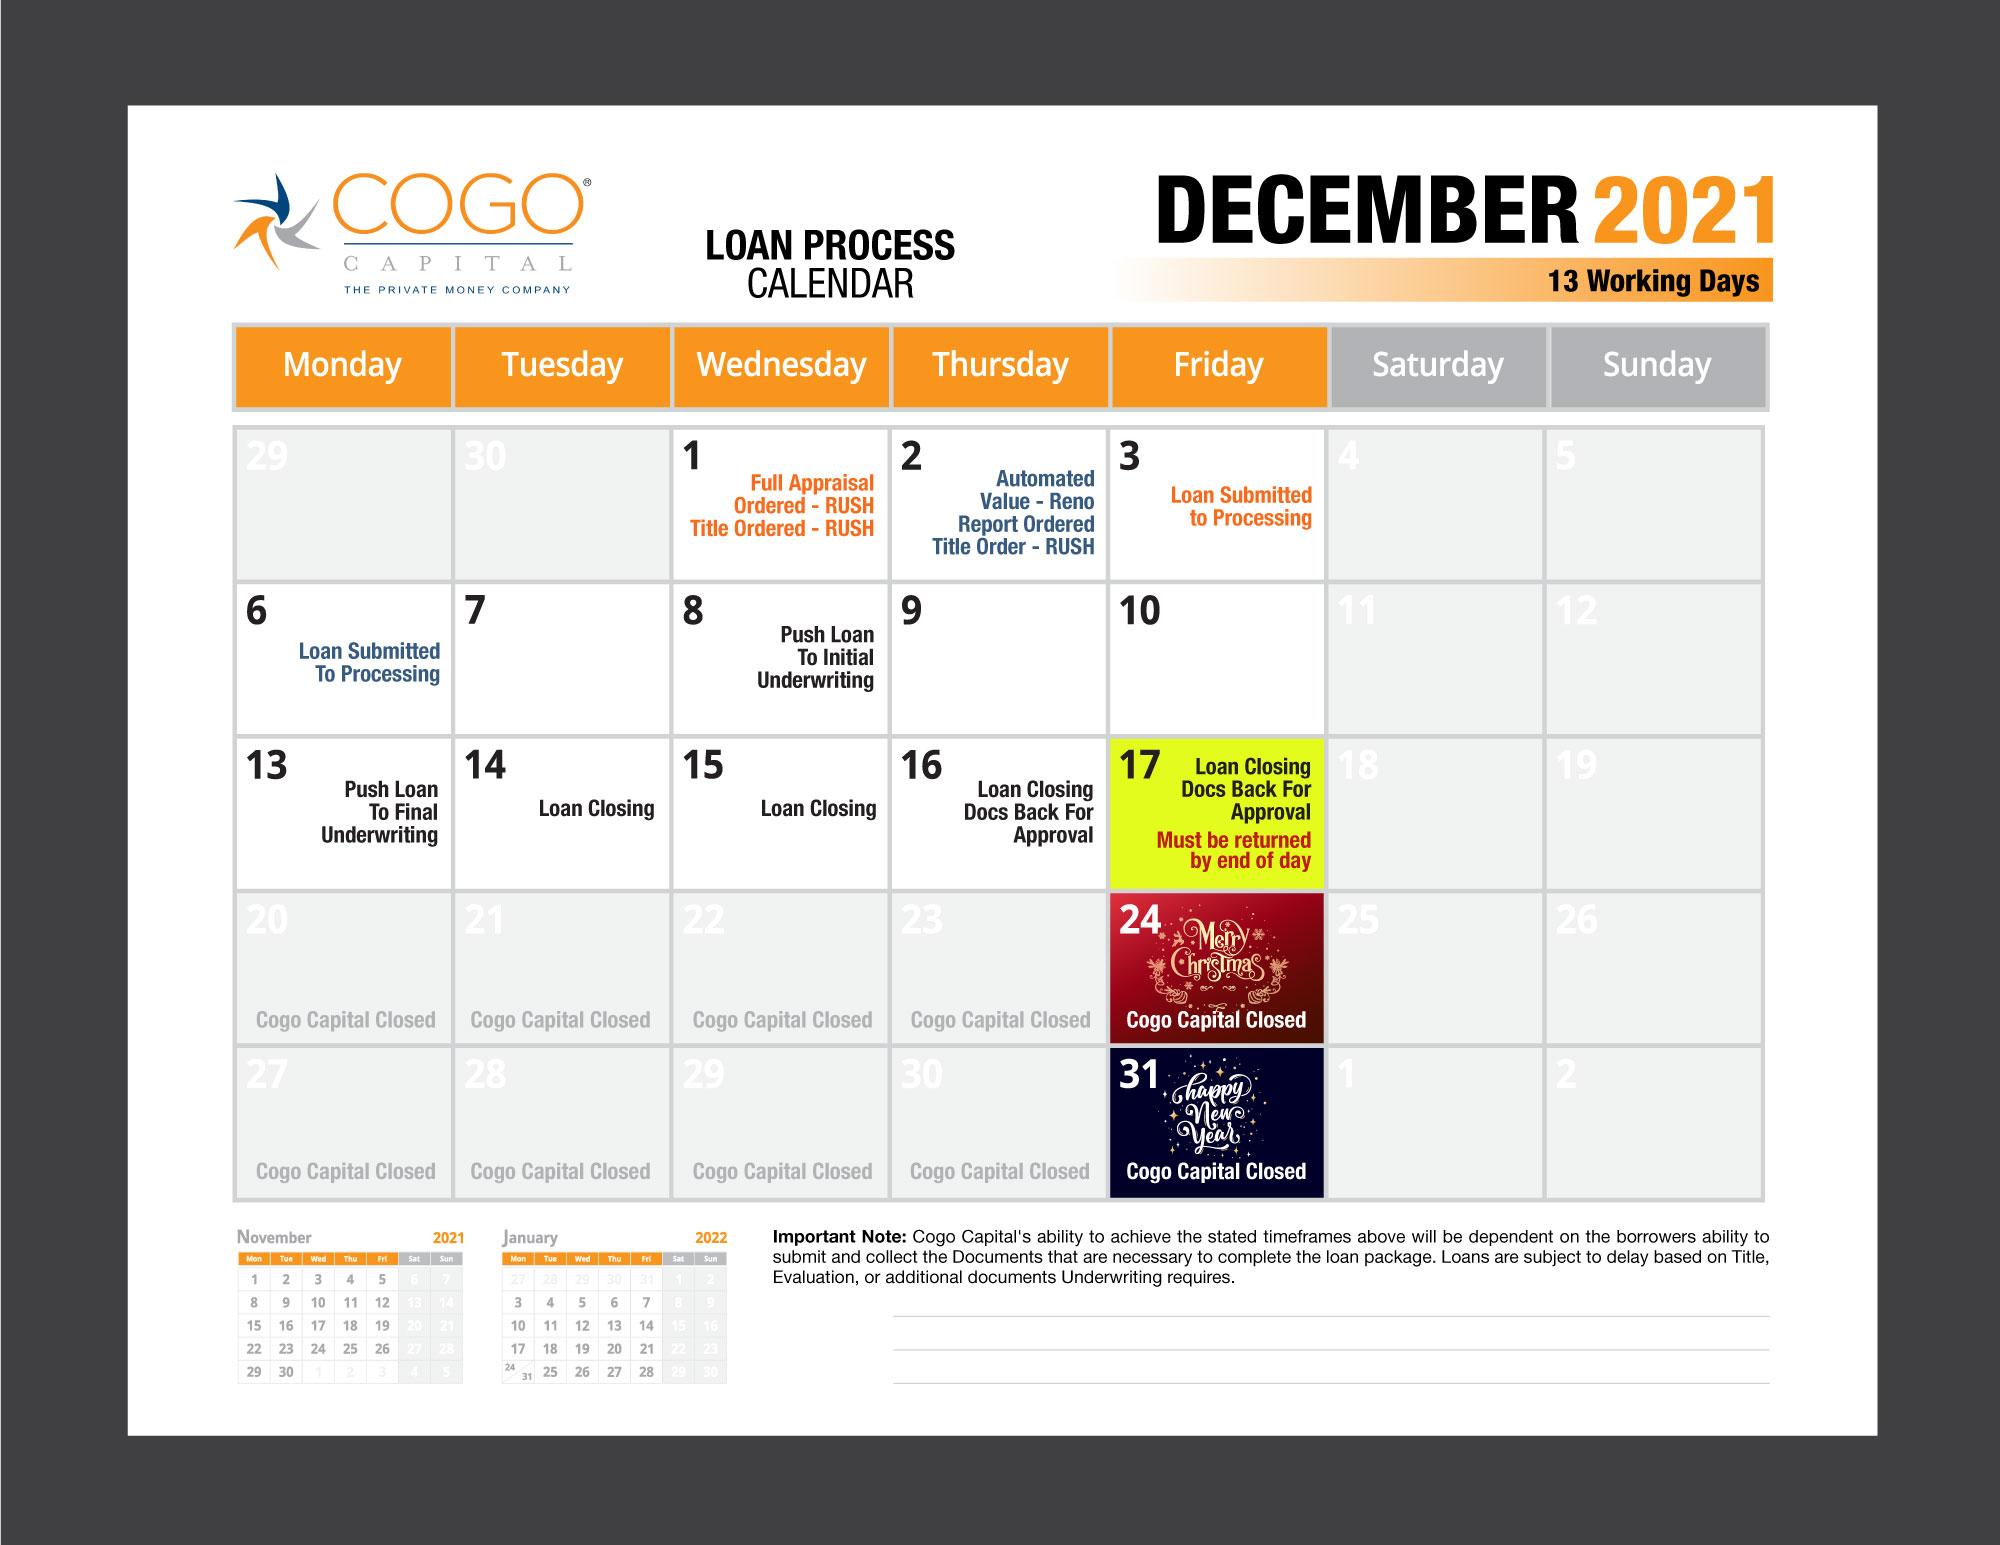 Cogo Loan Process Calendar - December